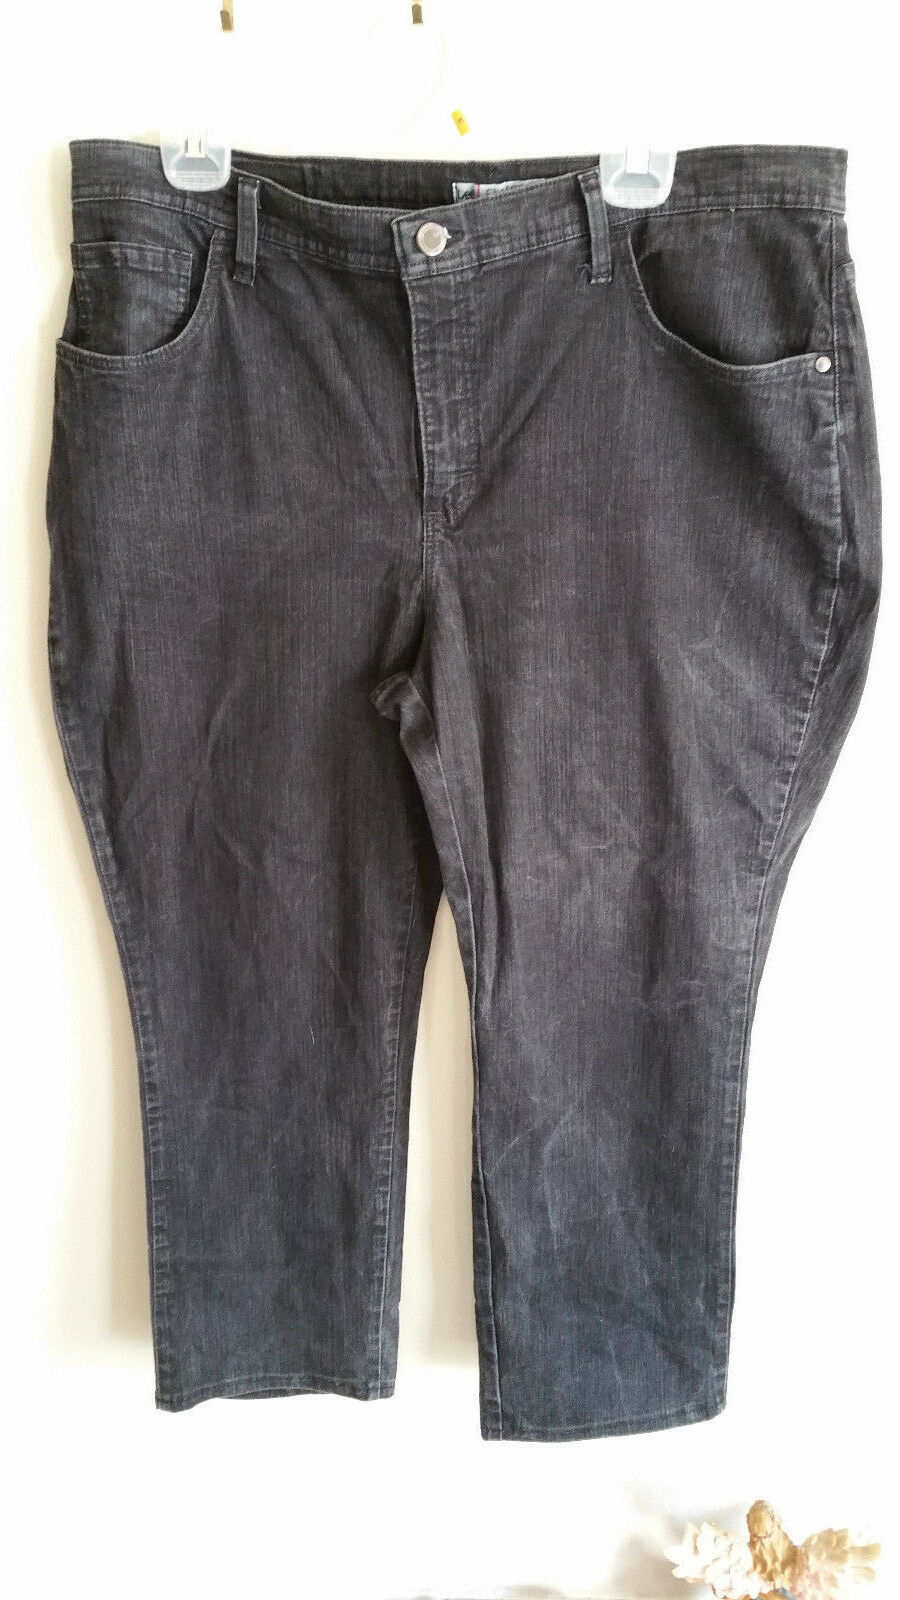 Plus size Petite 18W  Lee Jeans Classic Fit Dark Wash Stright Leg  image 4